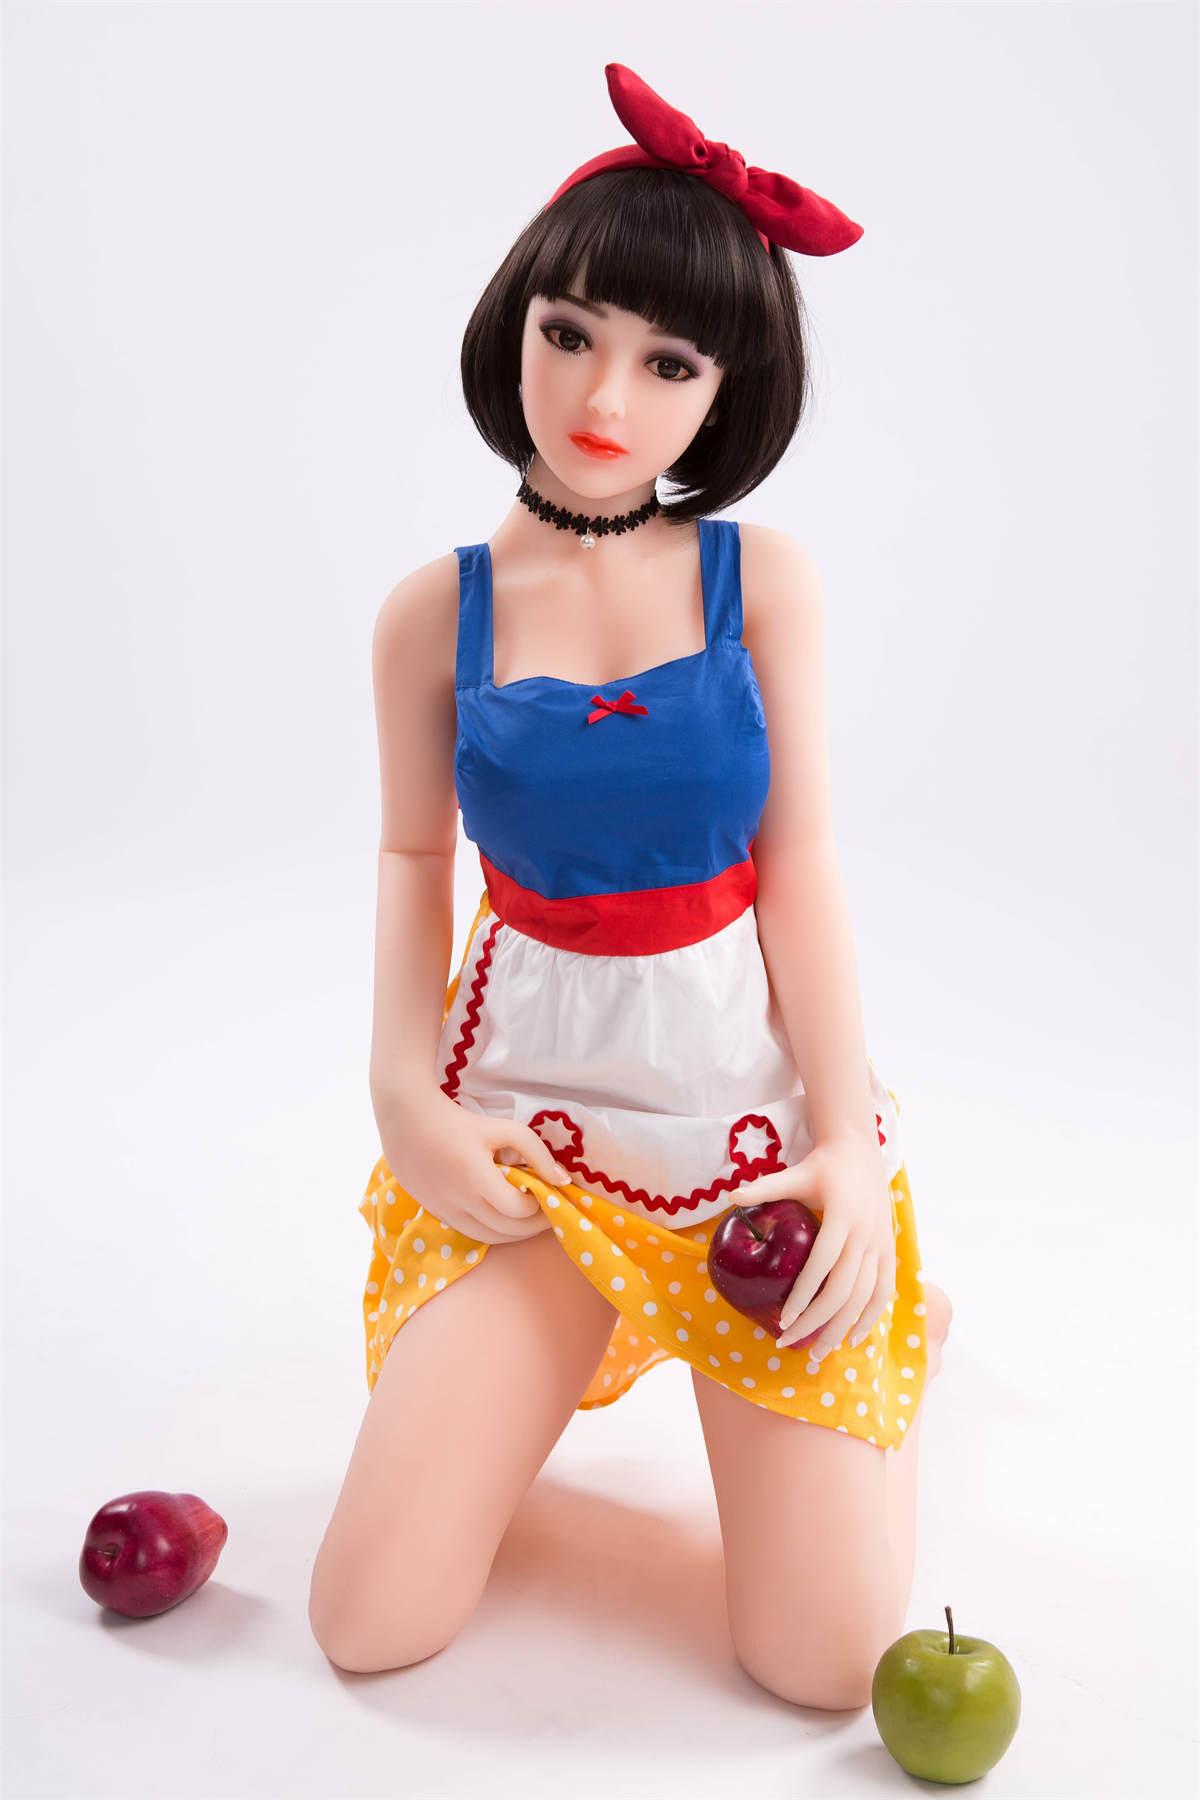 Scarlett-125cm Mini Real Silicone Sex Dolls Robot Realistic Vagina Anime Sexy Love Doll Skeleton Full Masturbator Adult Toys for Men (22)